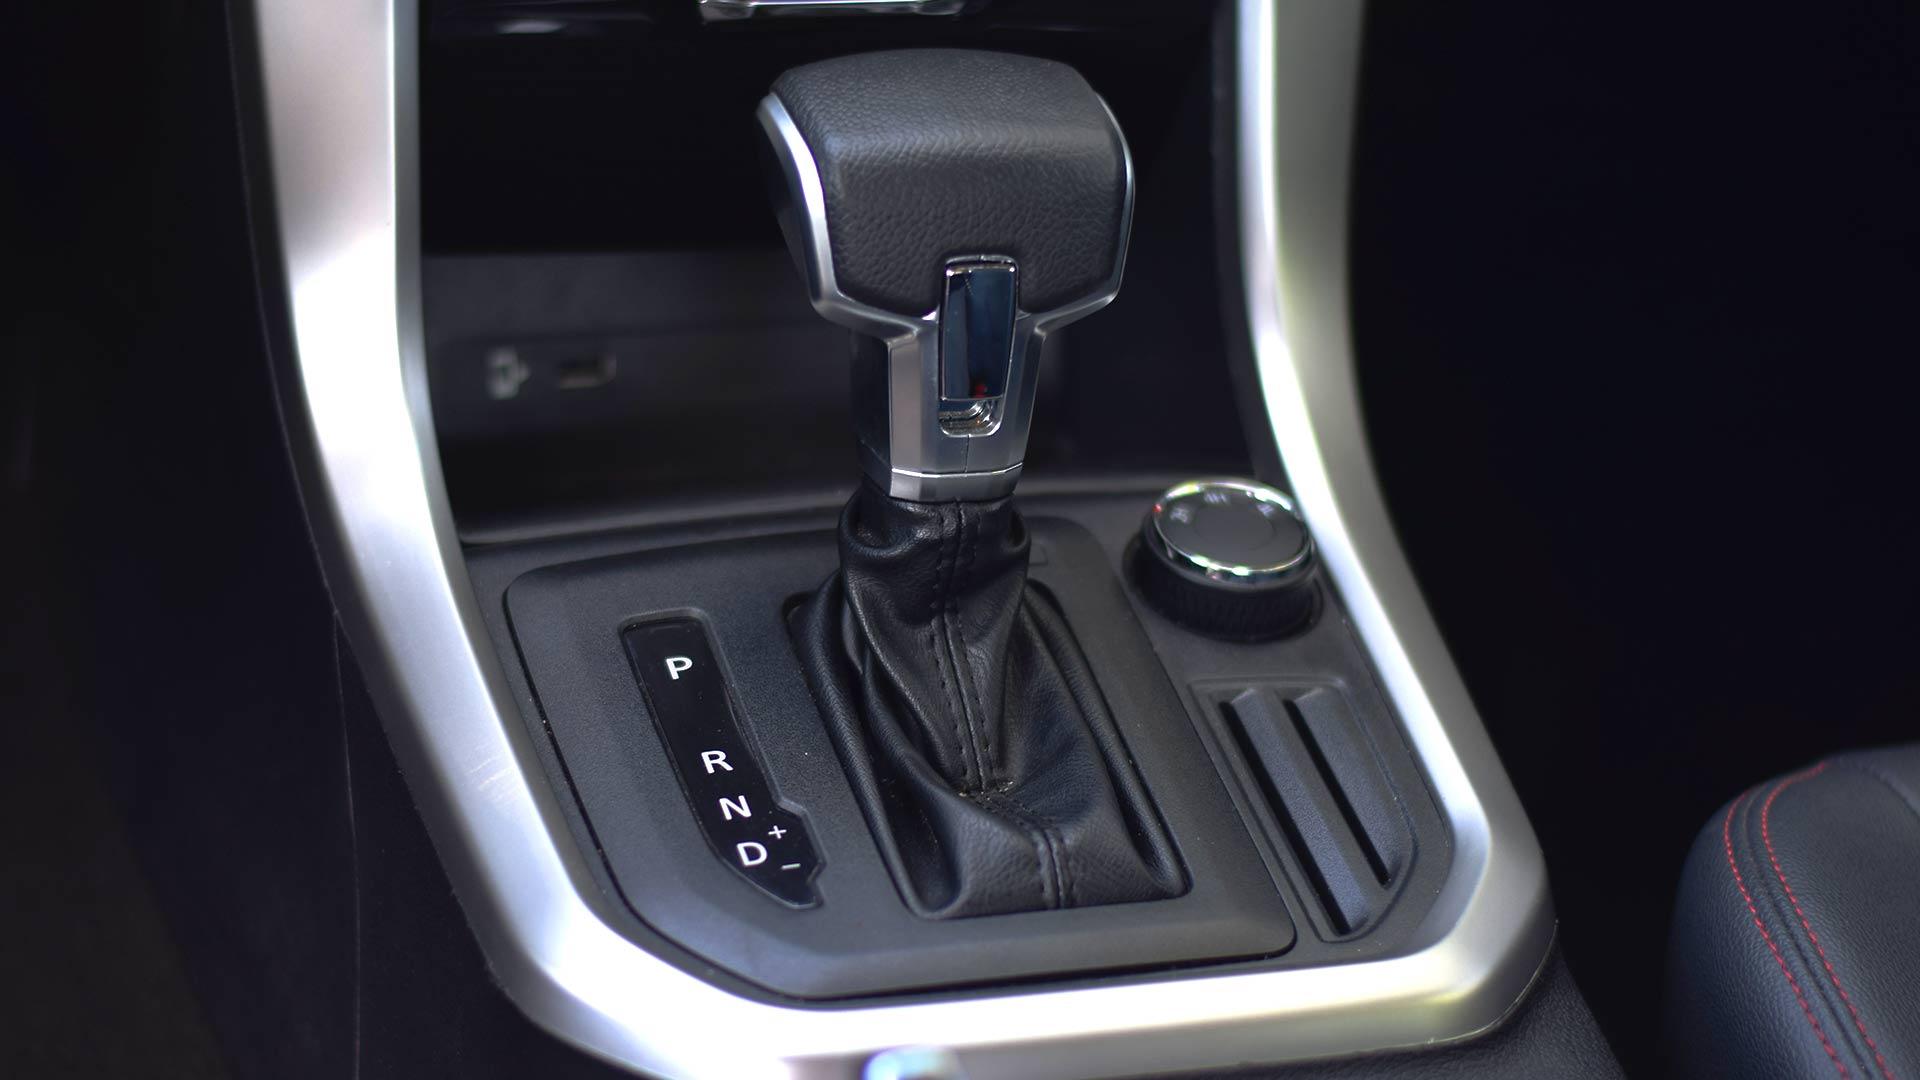 The Maxus T60 alternative angle